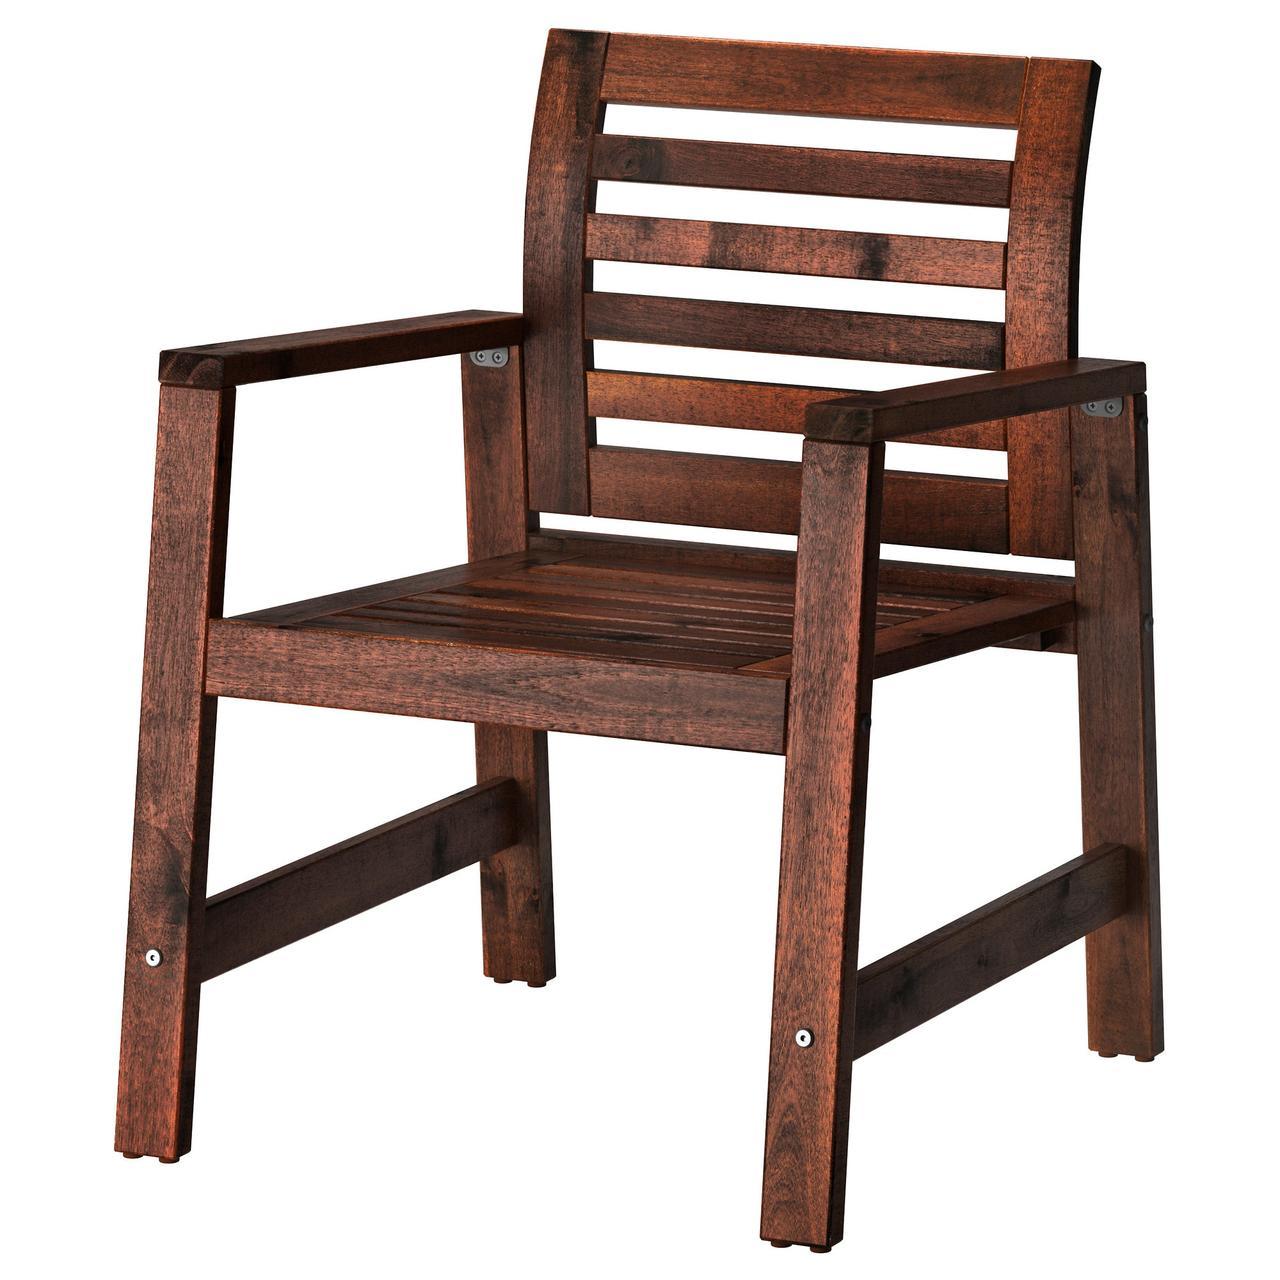 ЭПЛАРО Садовое кресло, коричневая морилка